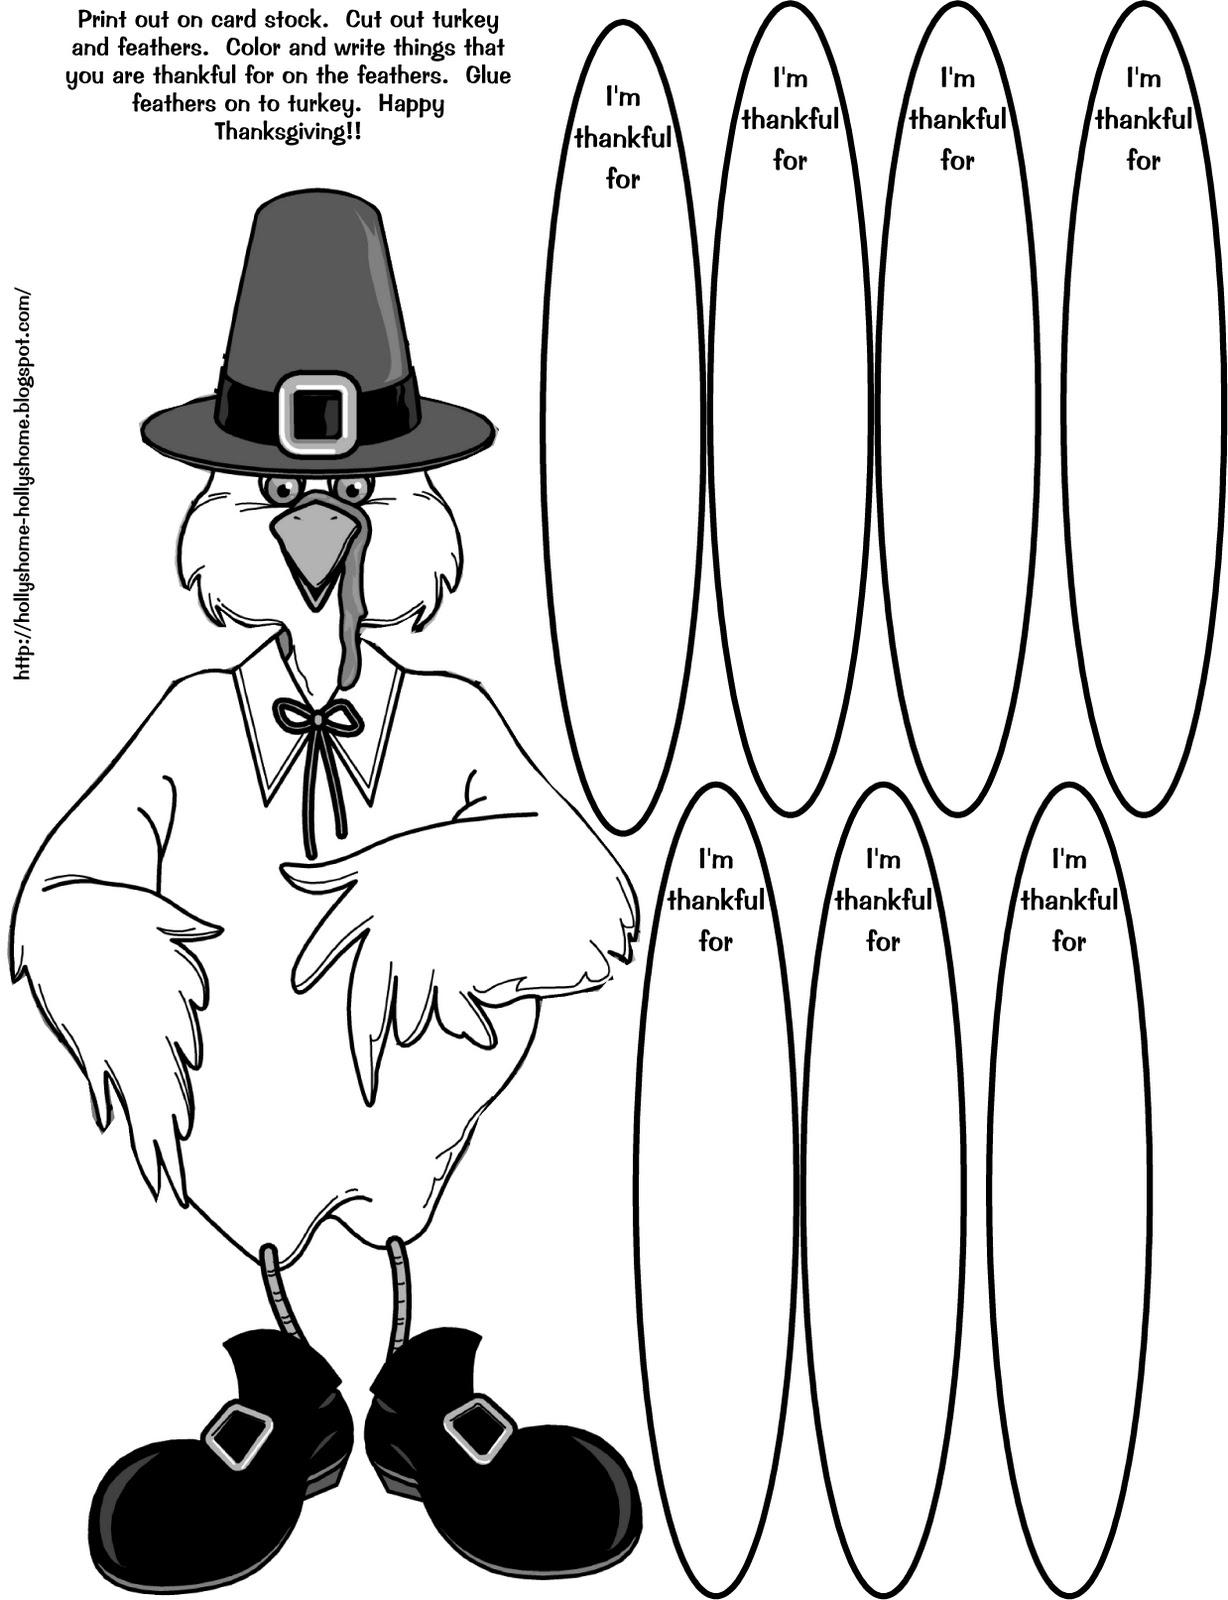 Hollyshome family life thankful turkey coloring craft for I am thankful for turkey coloring page